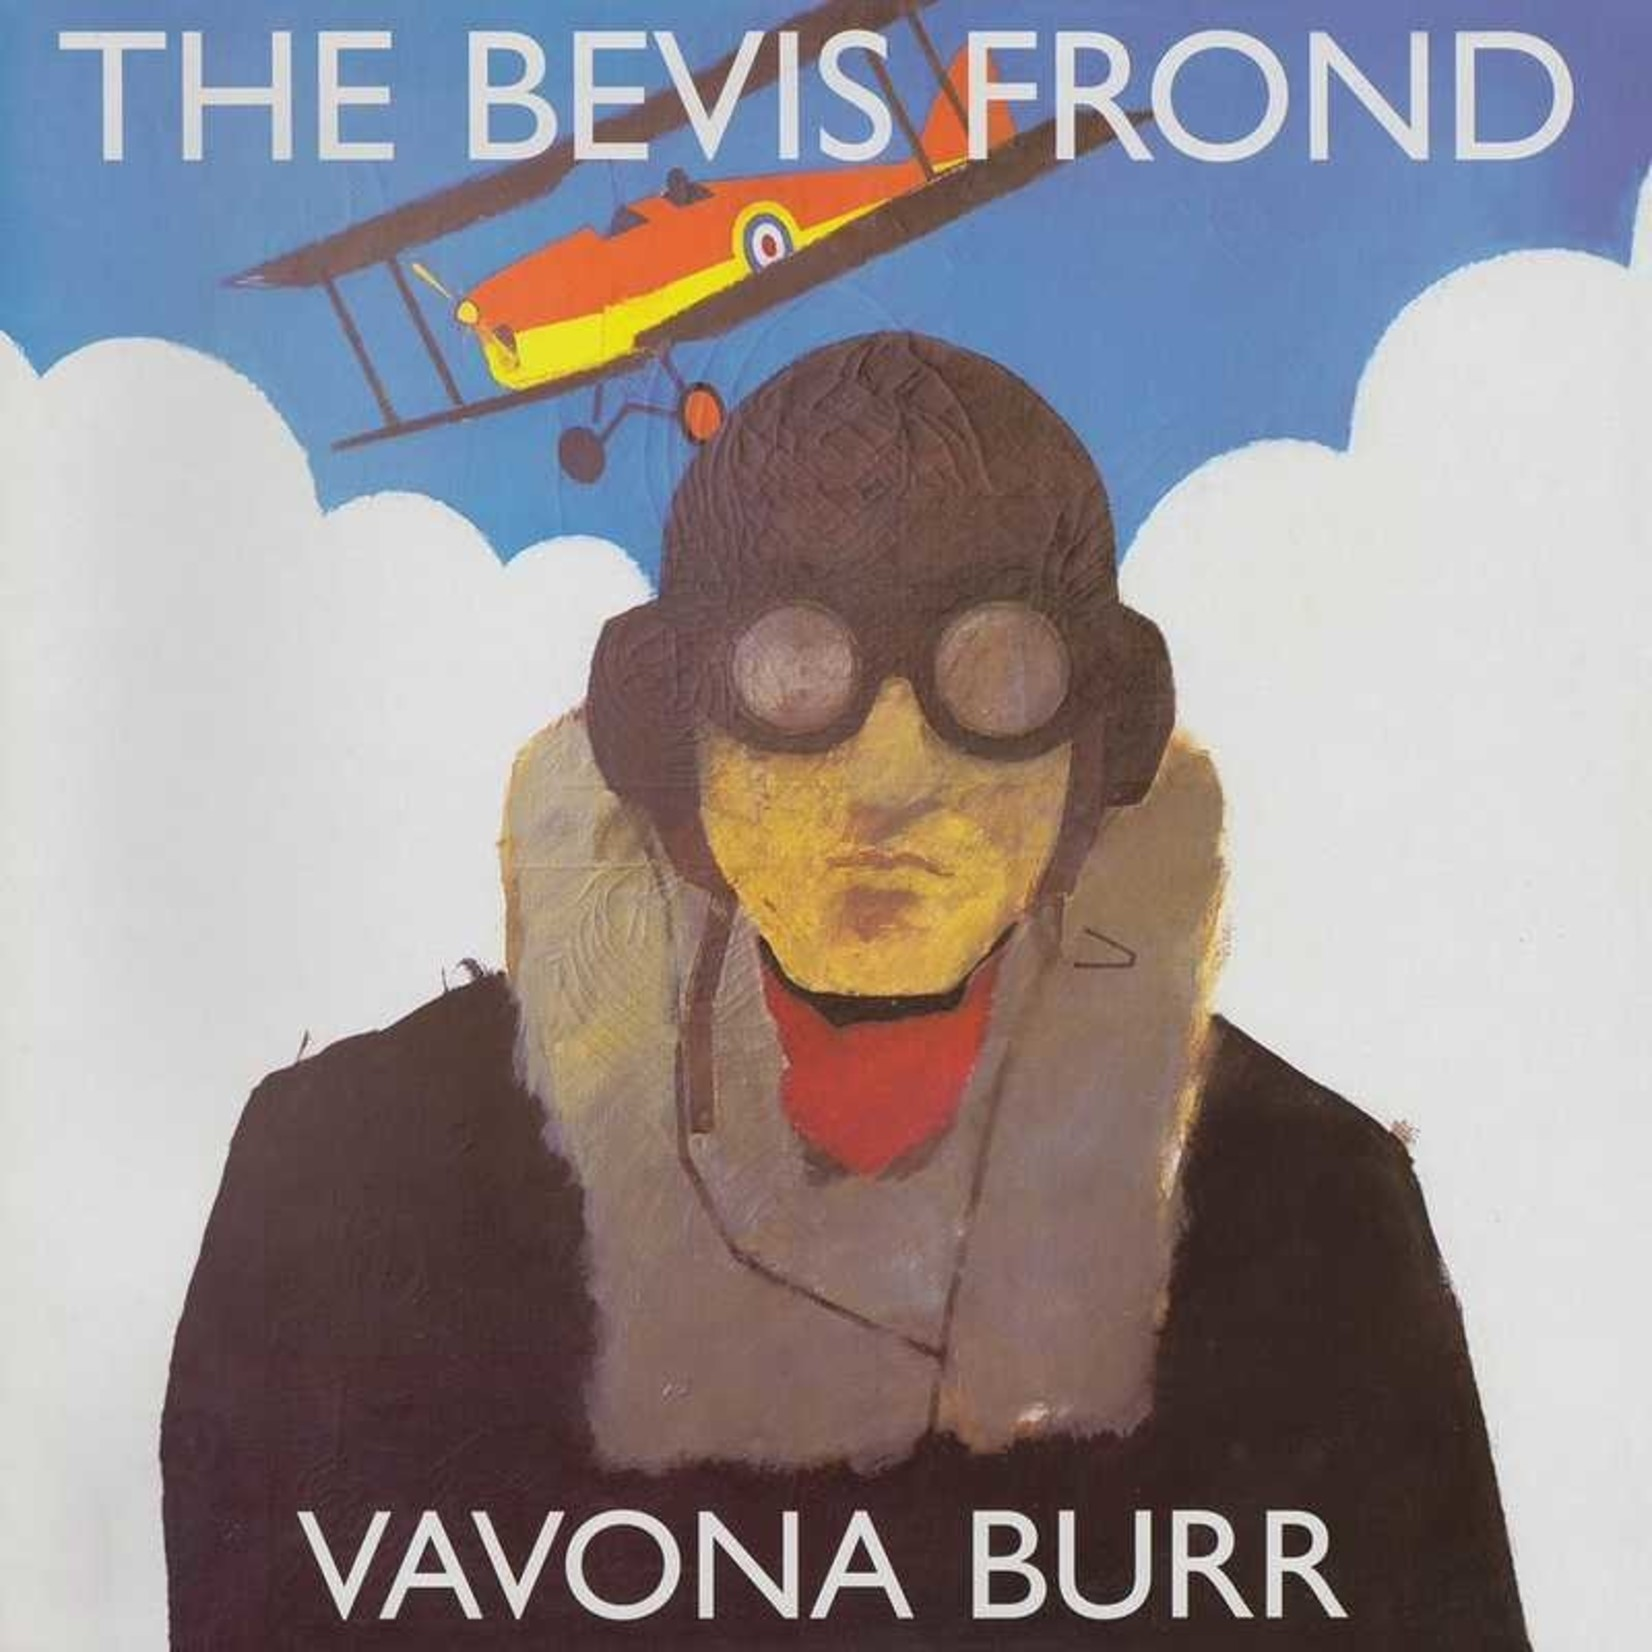 RSD 2019 - The Bevis Frond - Vavona Burr   (VINYL)